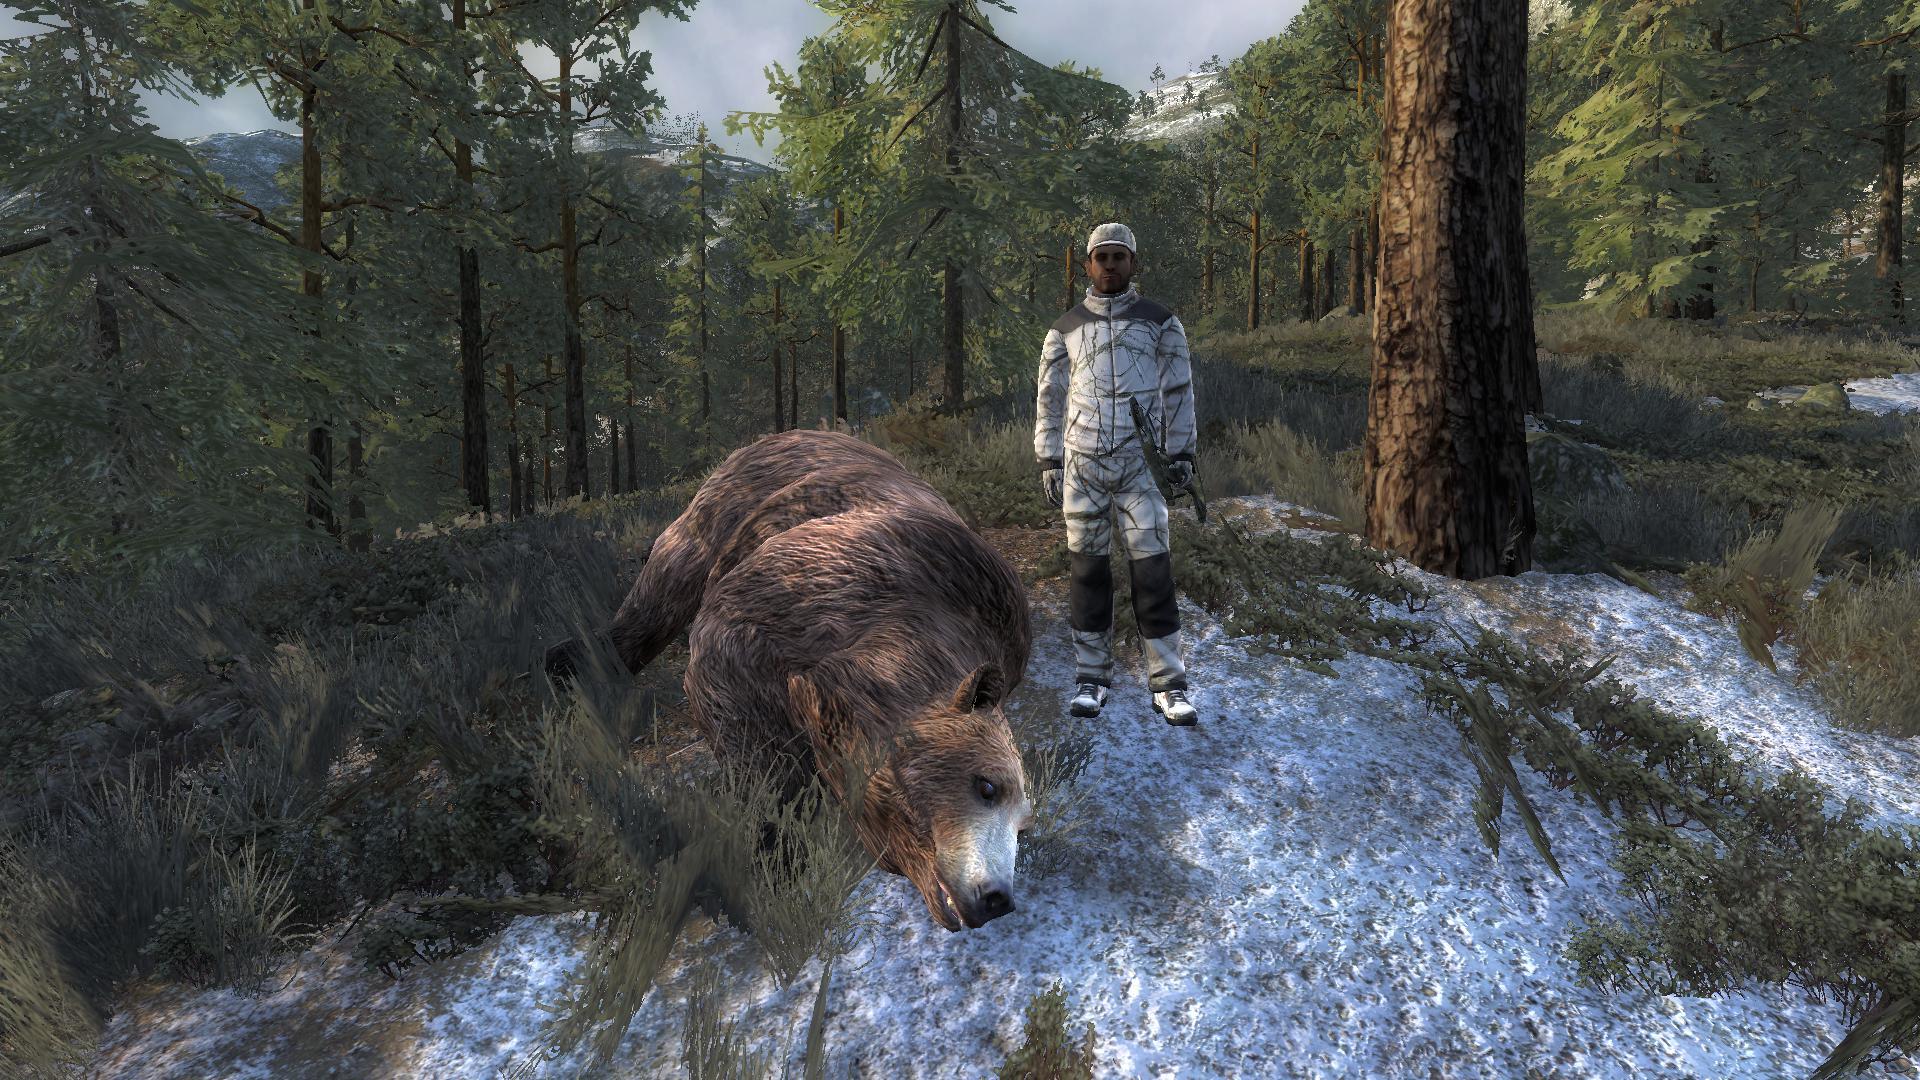 [CONCLUSA] Competizioni ufficiali TheHunteritaly - Orso Bruno King of Bears Fcfedb401f43d04ba34b0450cdeb1eba488a79eb